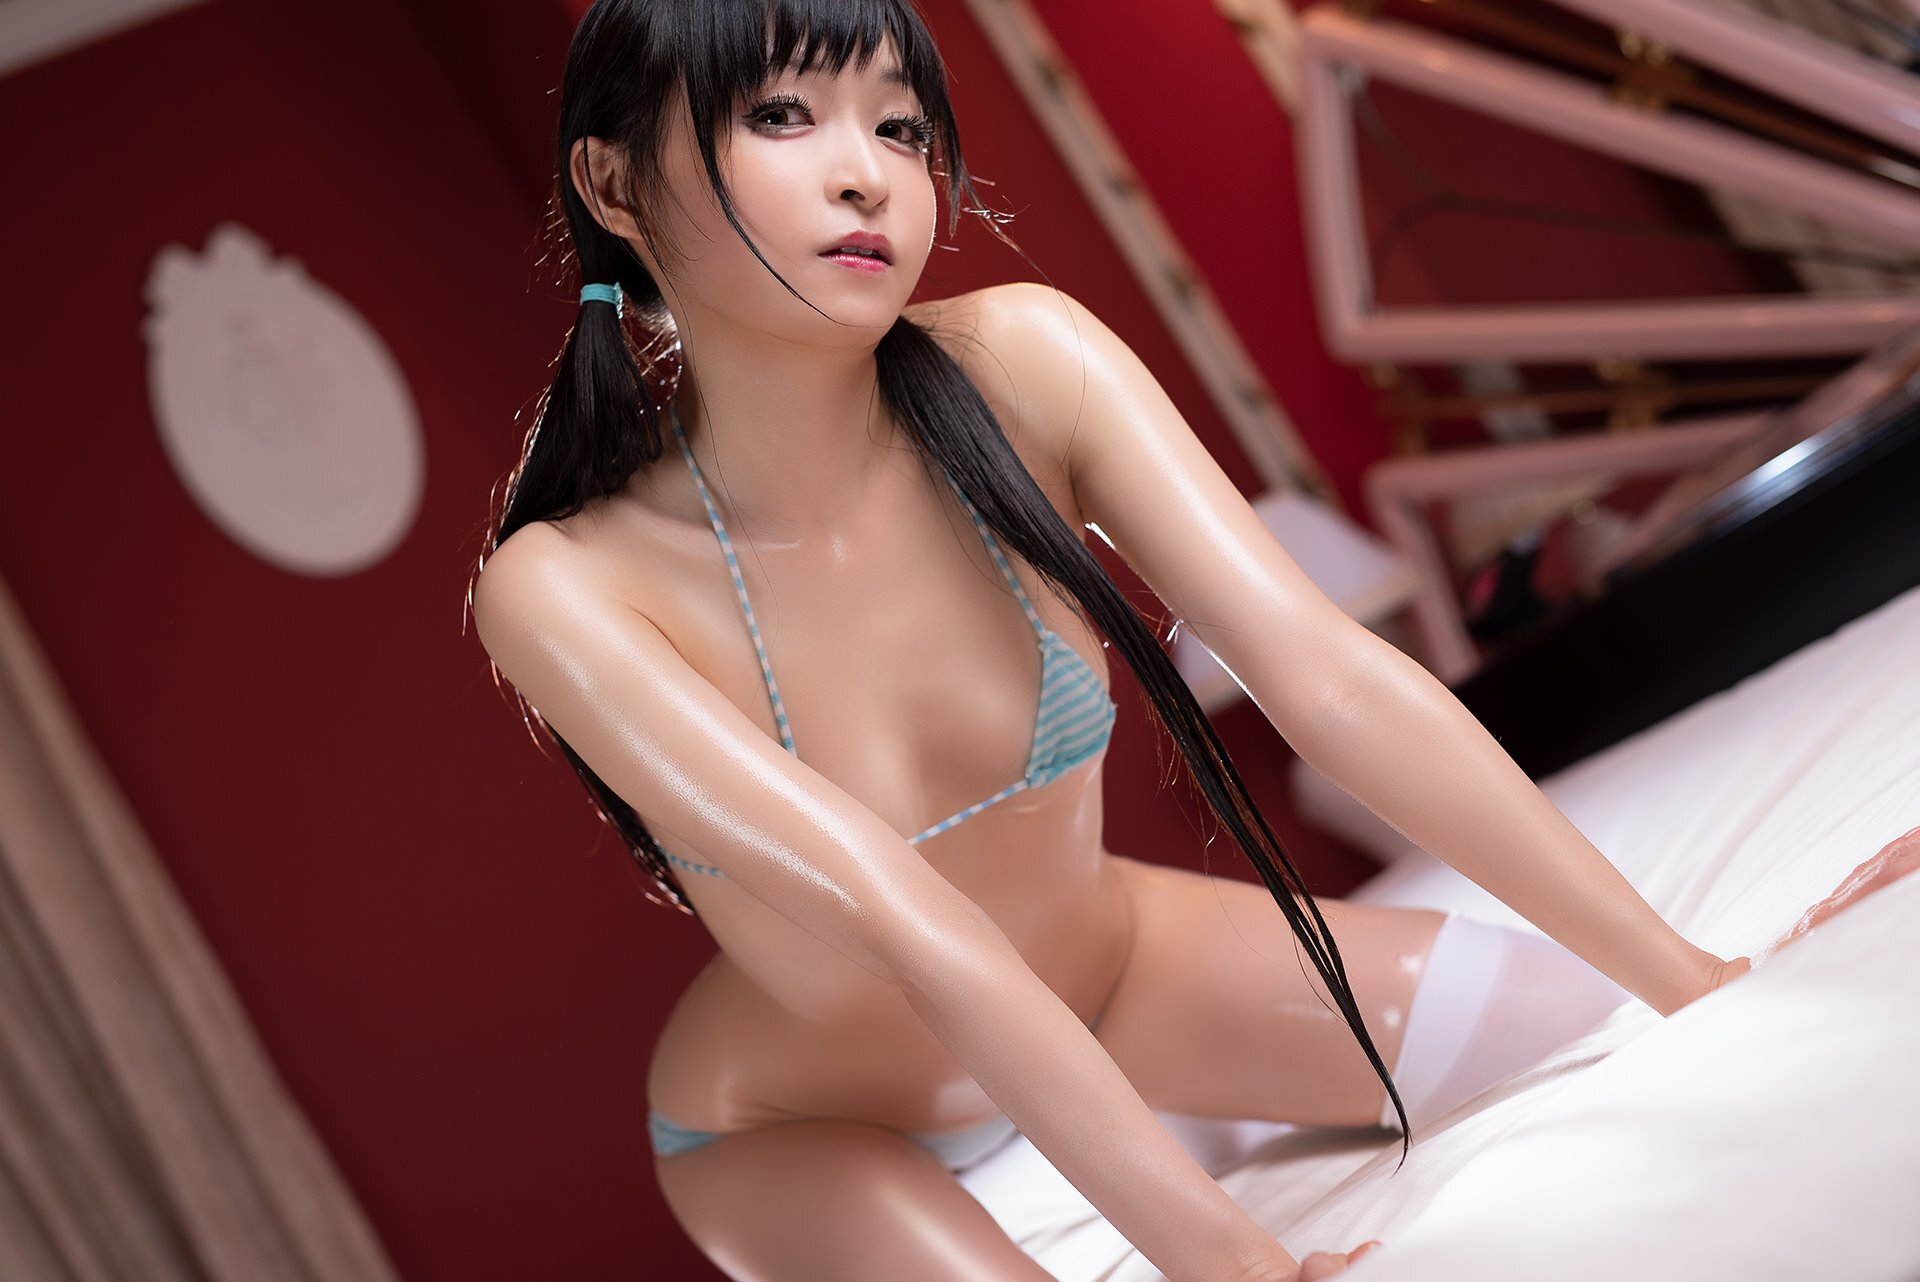 Mayu-Ronne-Cosplay-Sets-Skimpily-Seductive-14.jpg